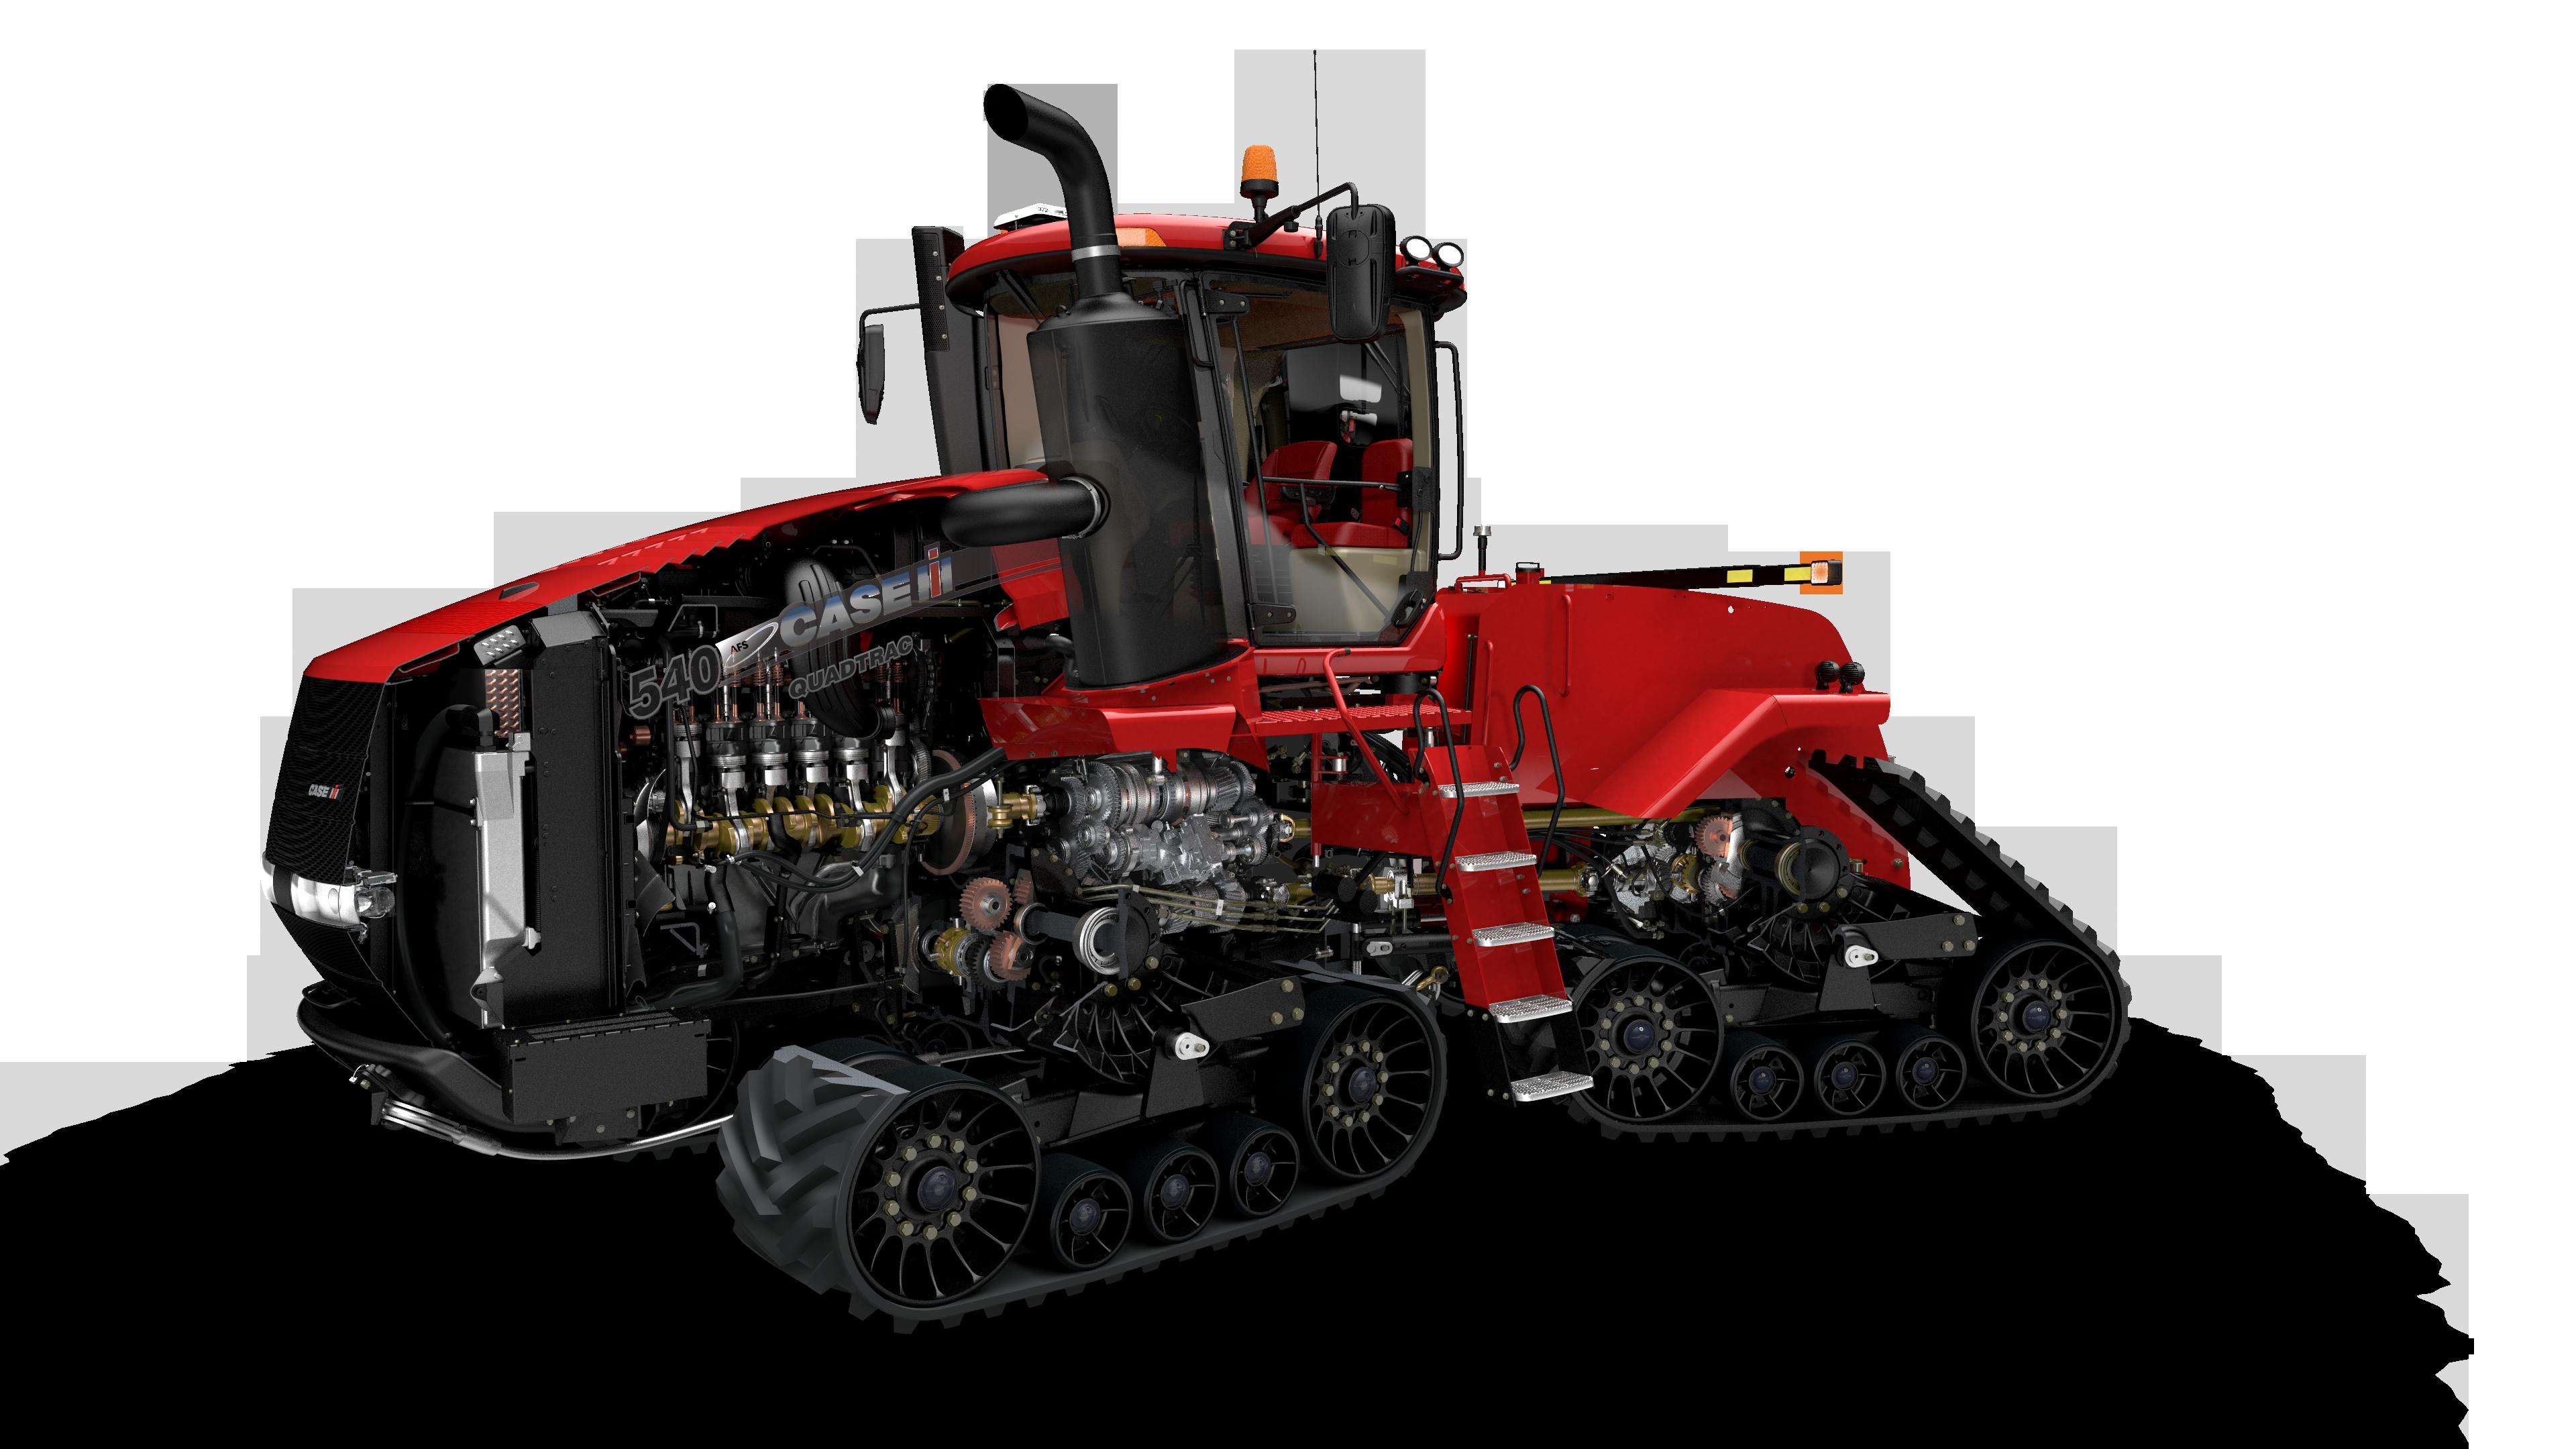 4WD_CASE_MY18_NA_540_QUADTRAC_CUTAWAY_27jul17?width=630&height=350 steiger series 4wd row crop farming tractors case ih  at gsmx.co